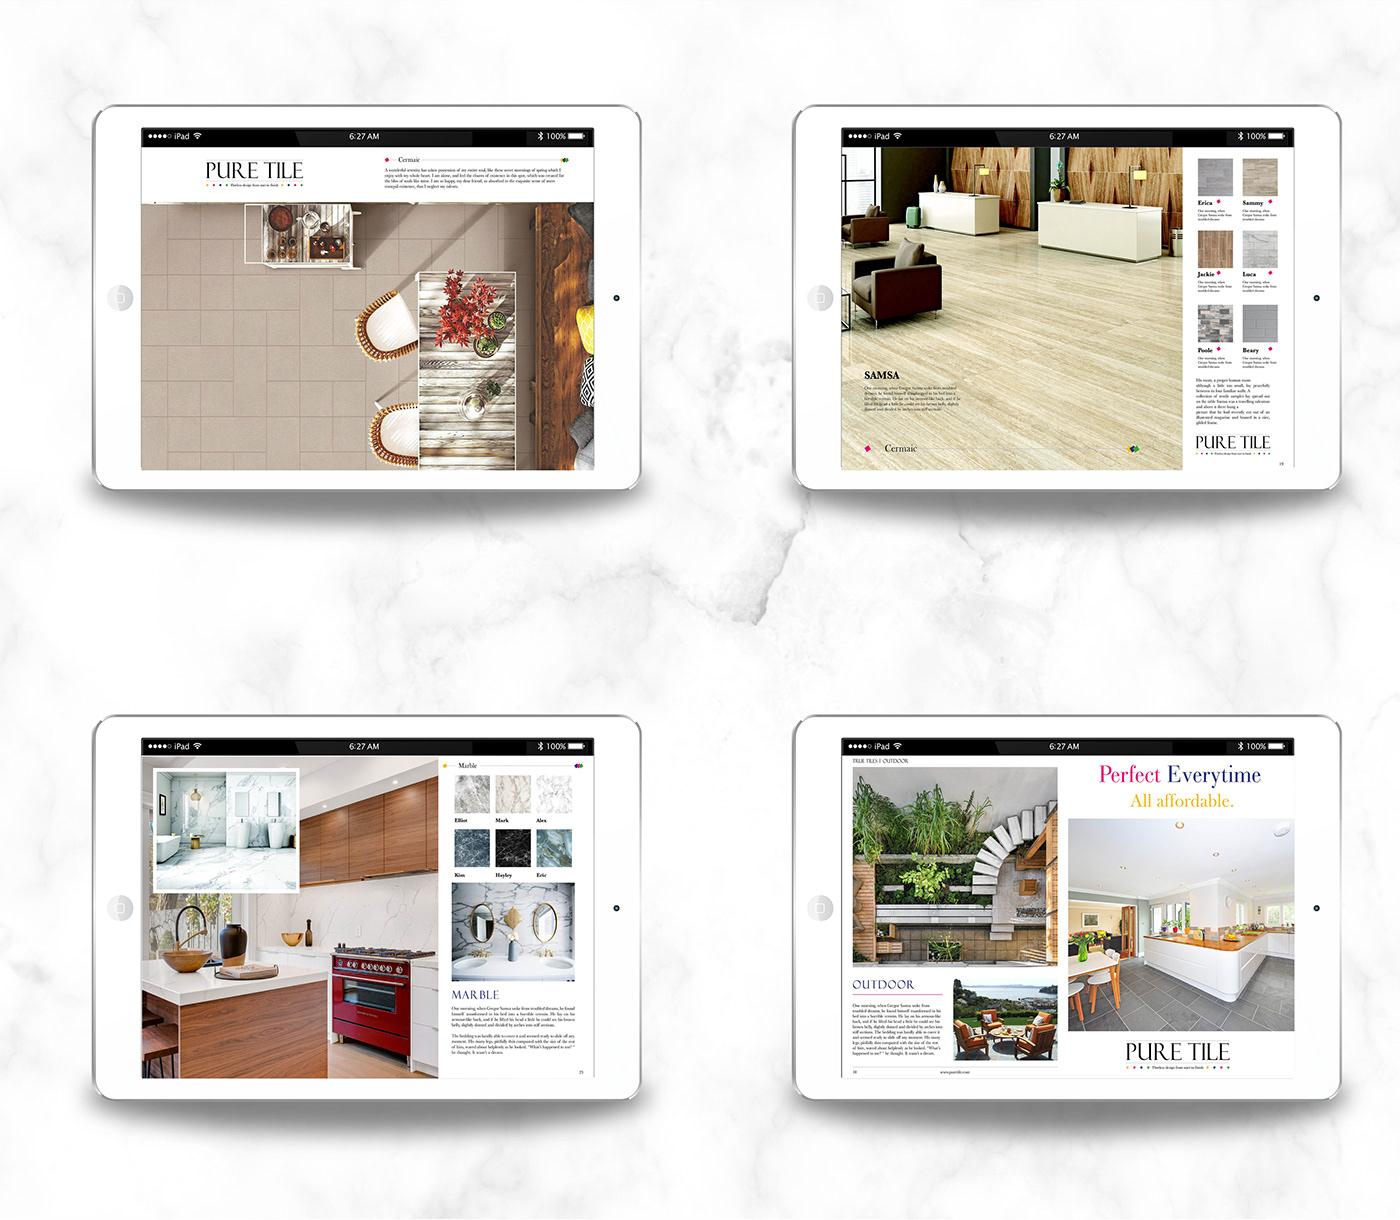 Image may contain: screenshot, layout and furniture